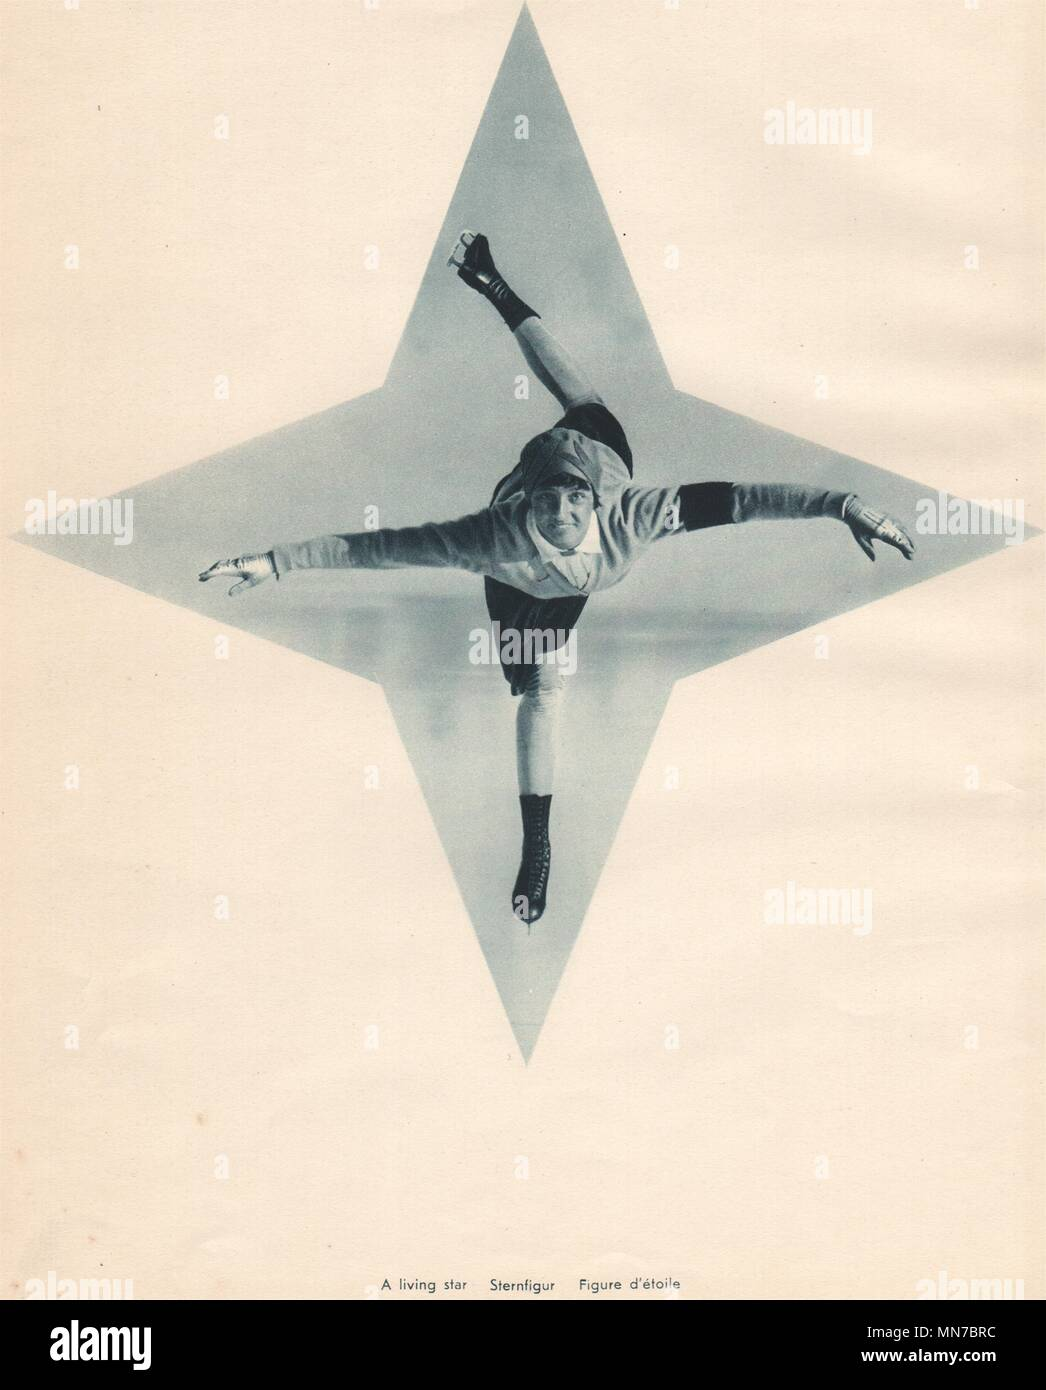 ICE FIGURE SKATING. A living star - Sternfigur - Figure d'étoile 1935 print - Stock Image